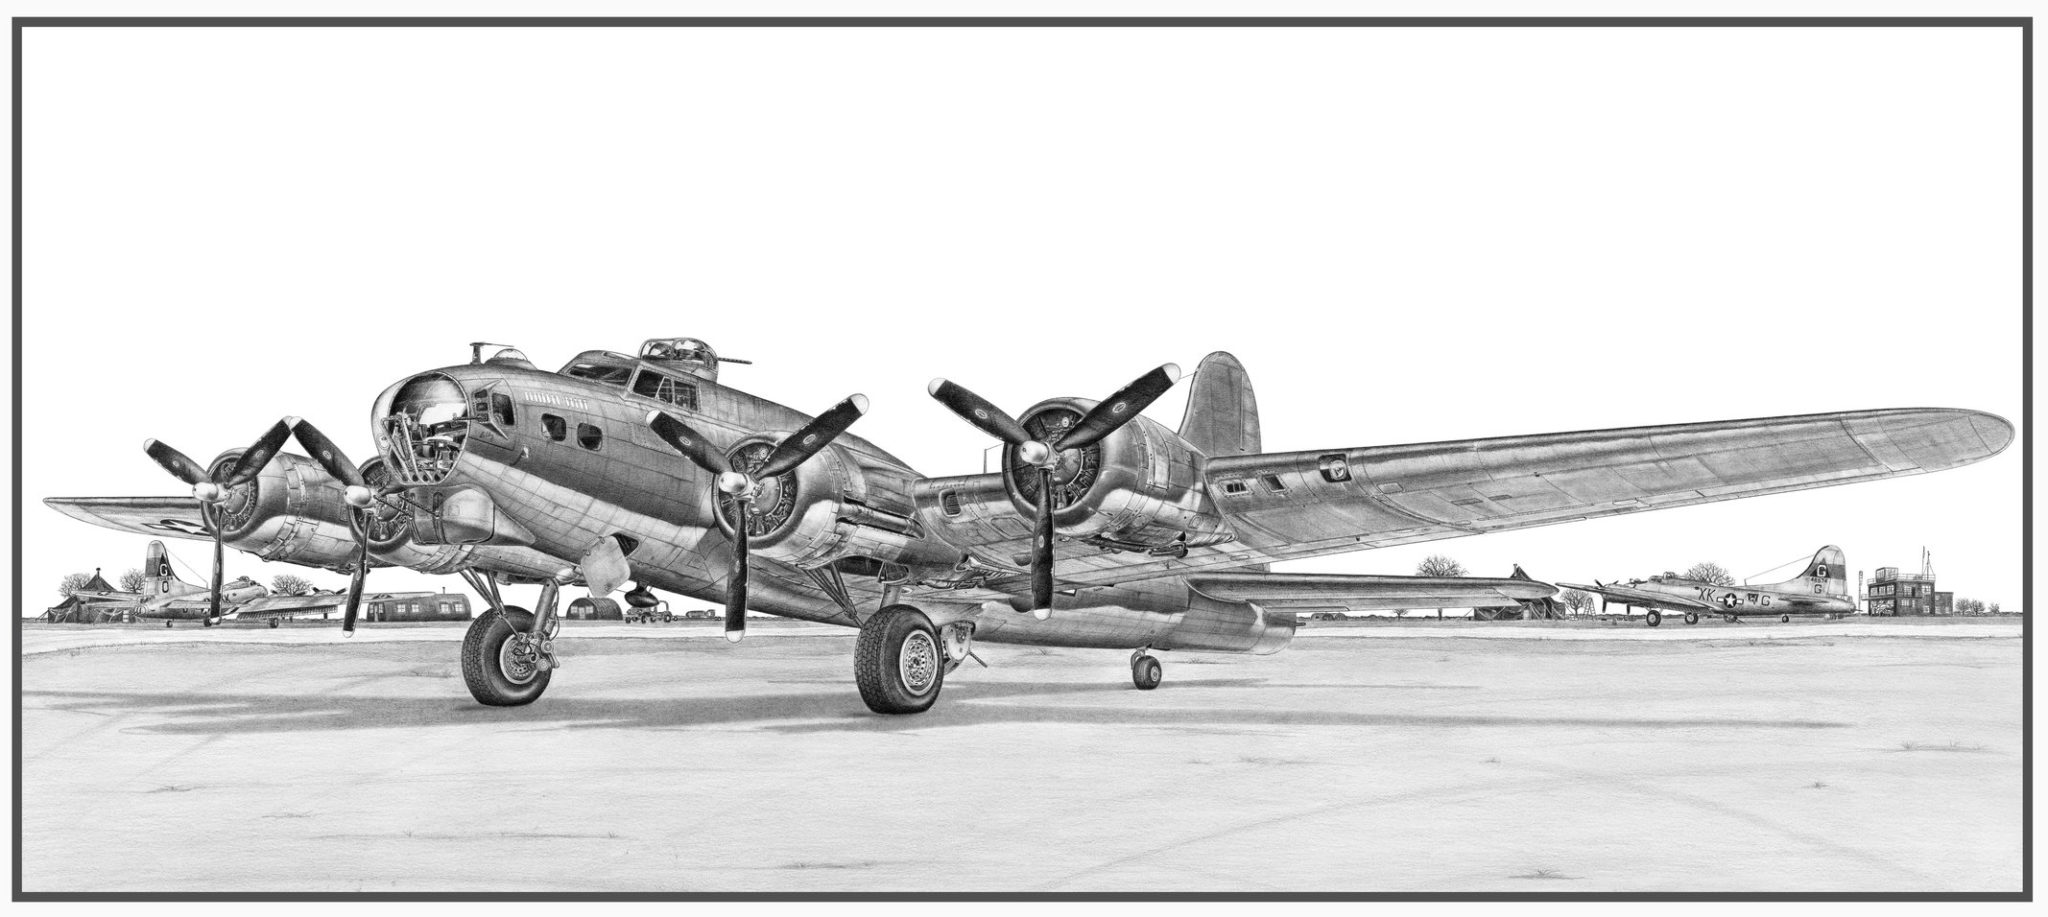 B-17G Fling Fortress Doug Kinsley Print 1